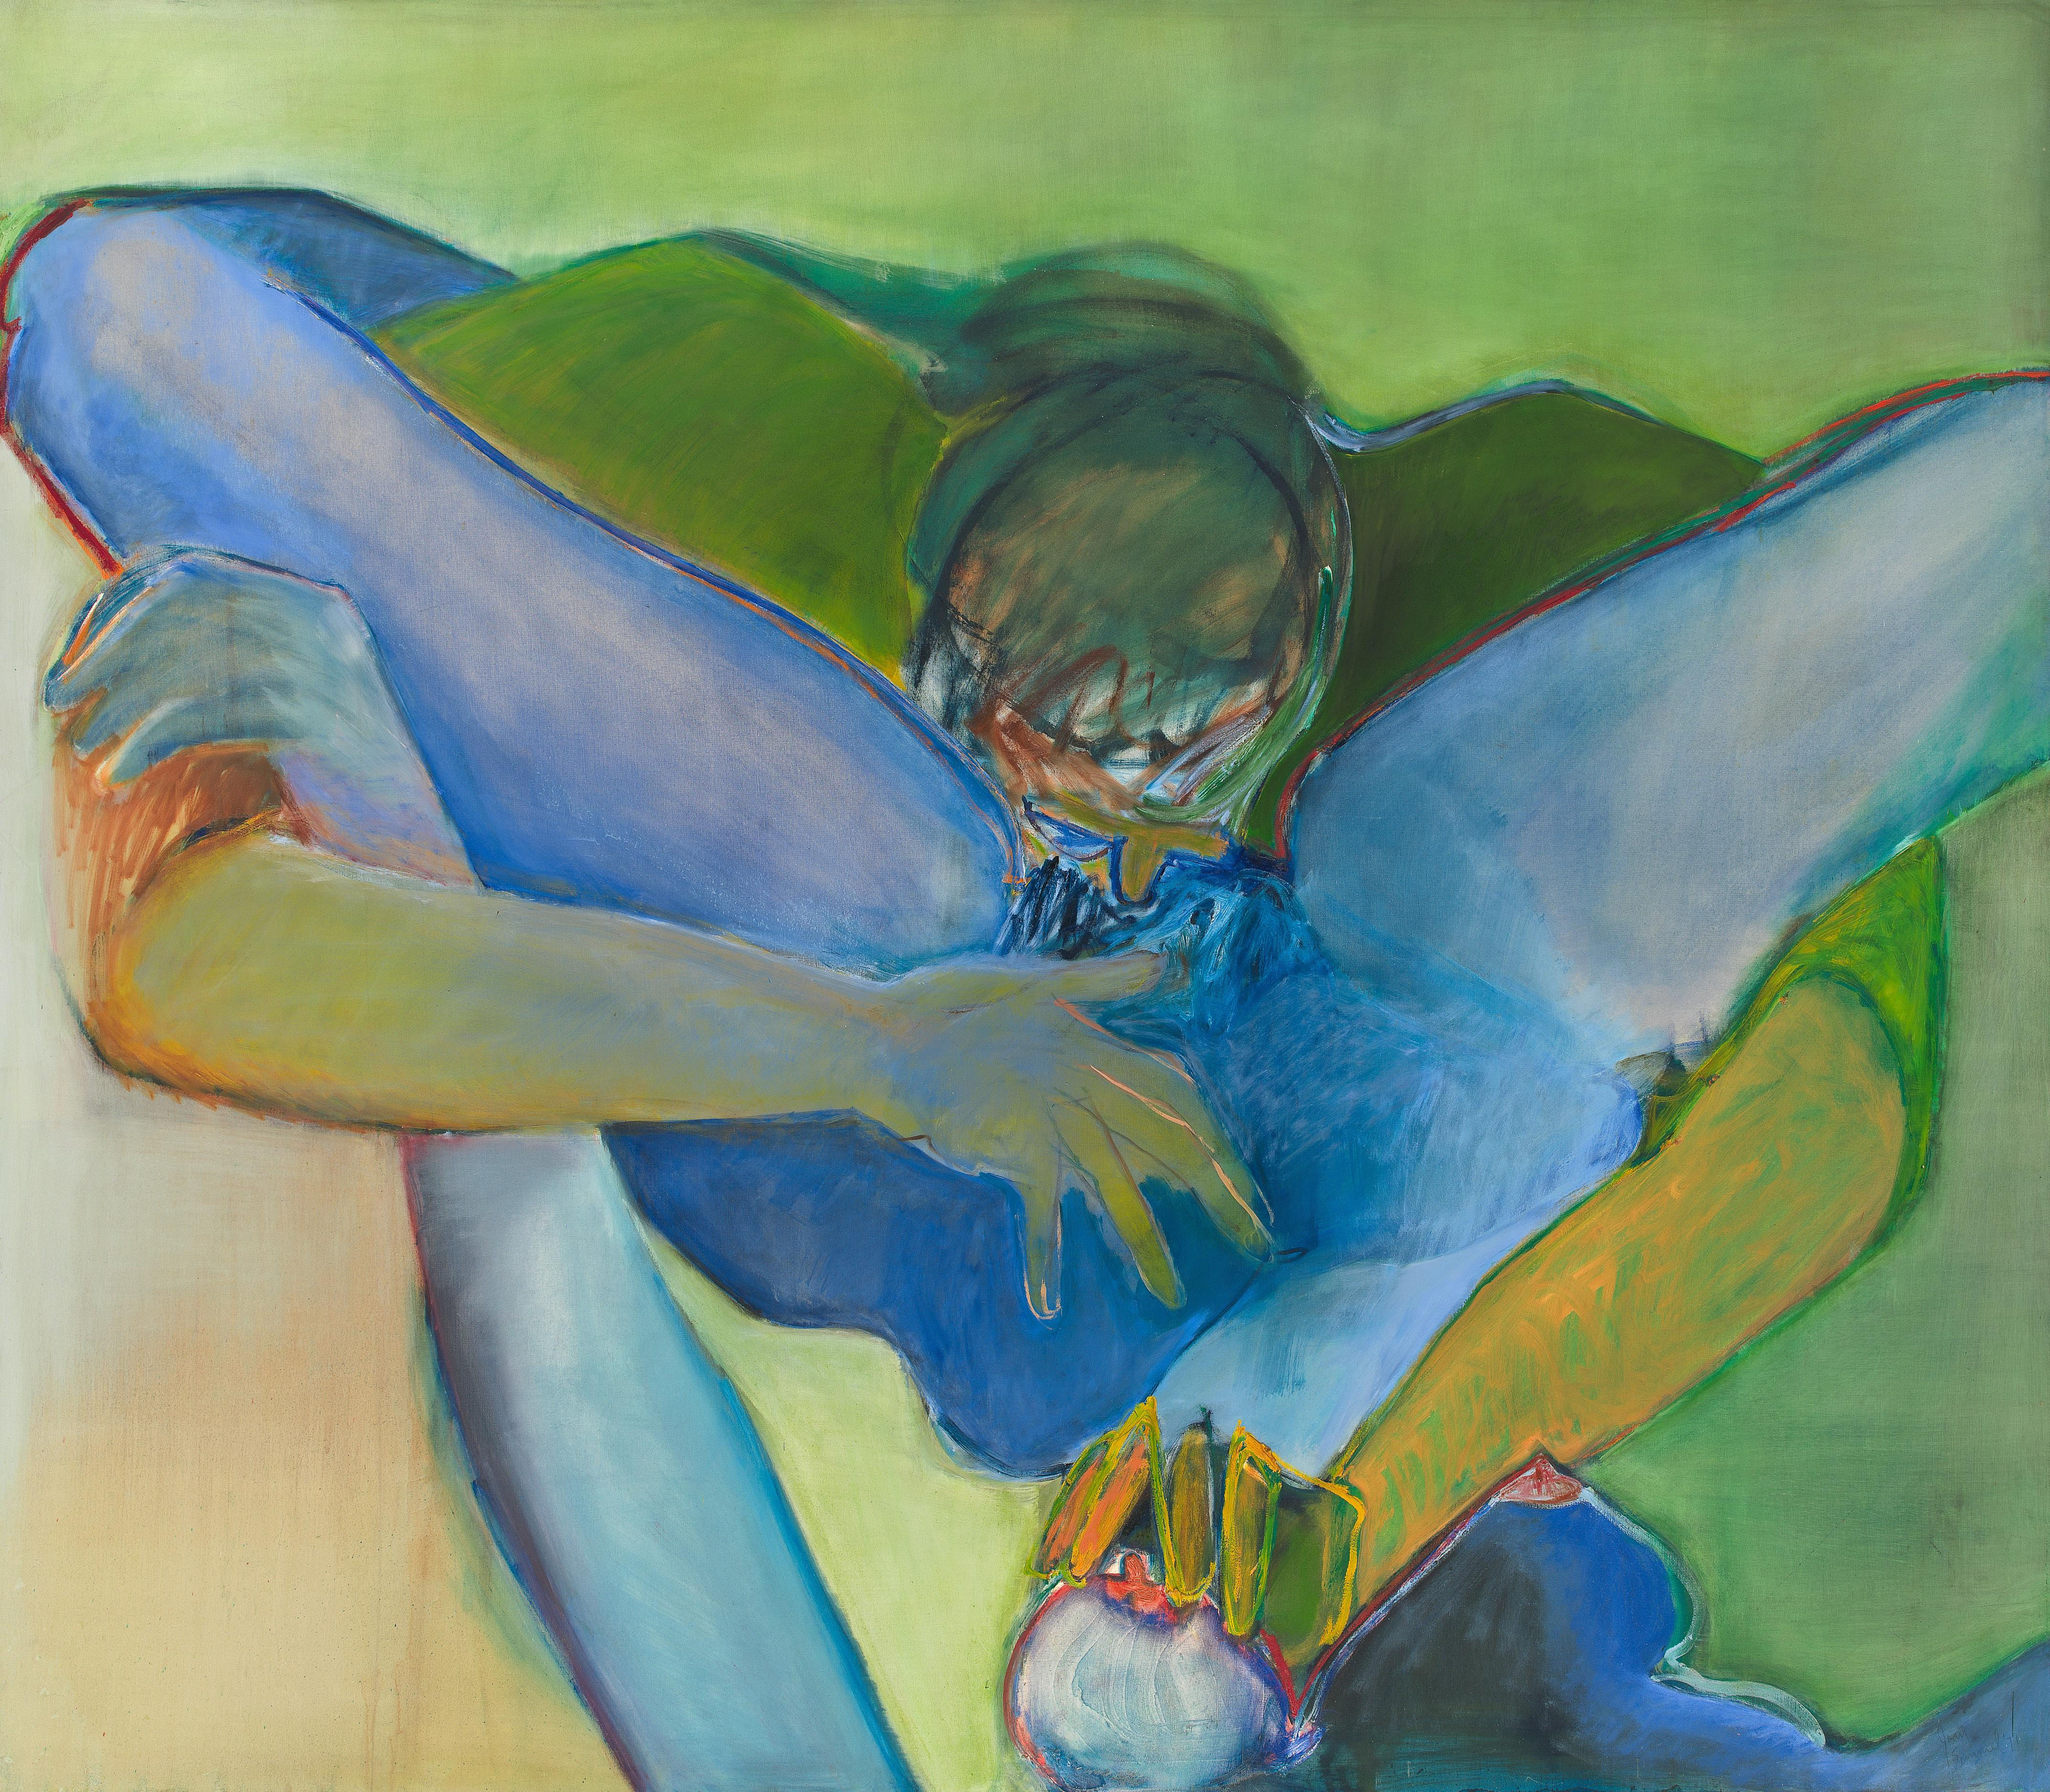 joan semmel untitled erotic erotica nude naked painting painter artist art